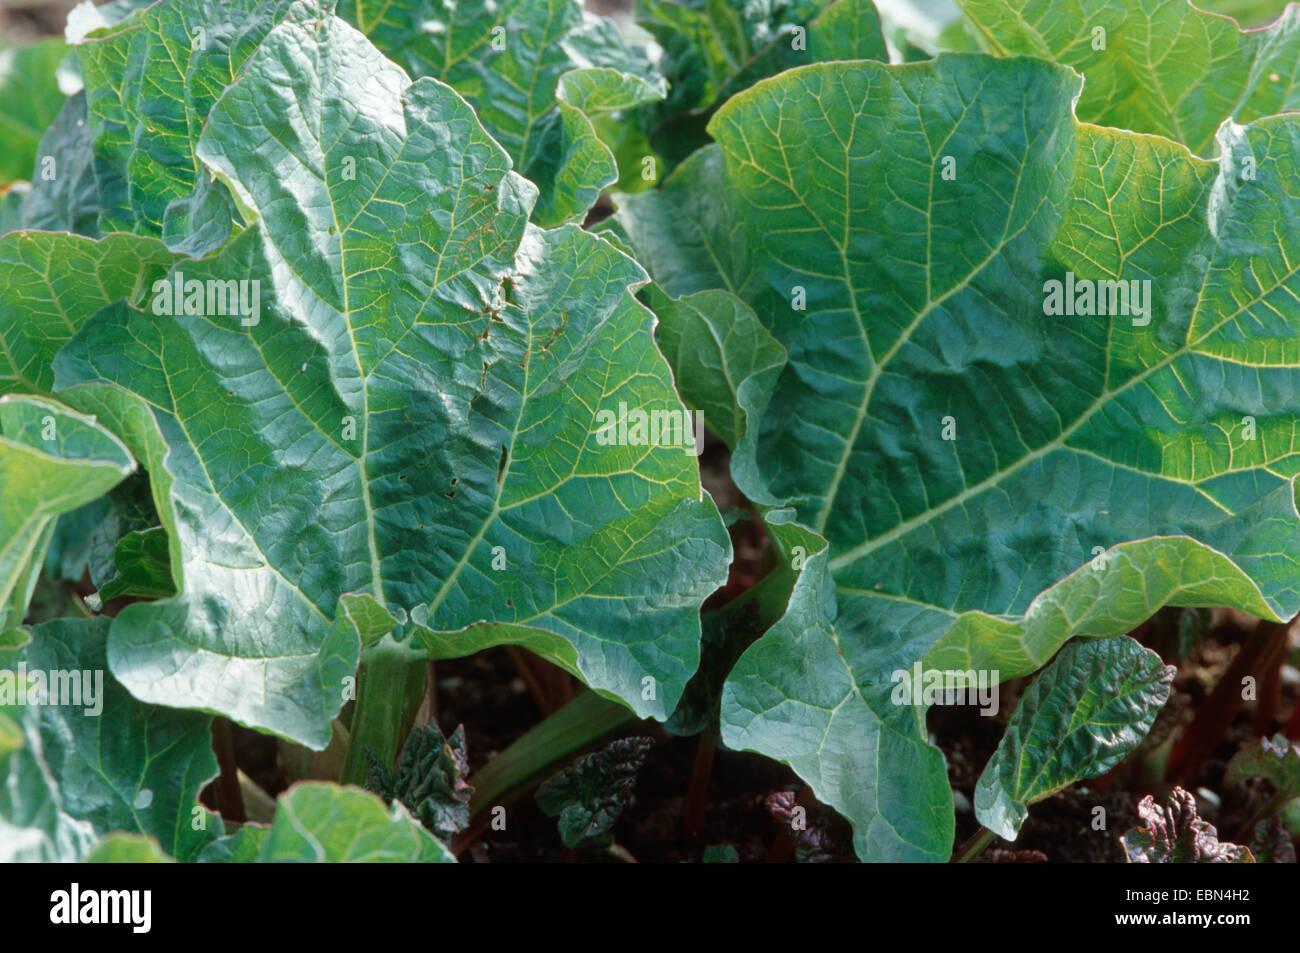 rhubarb (Rheum rhaponticum, Rheum rhabarbarum), leaves - Stock Image